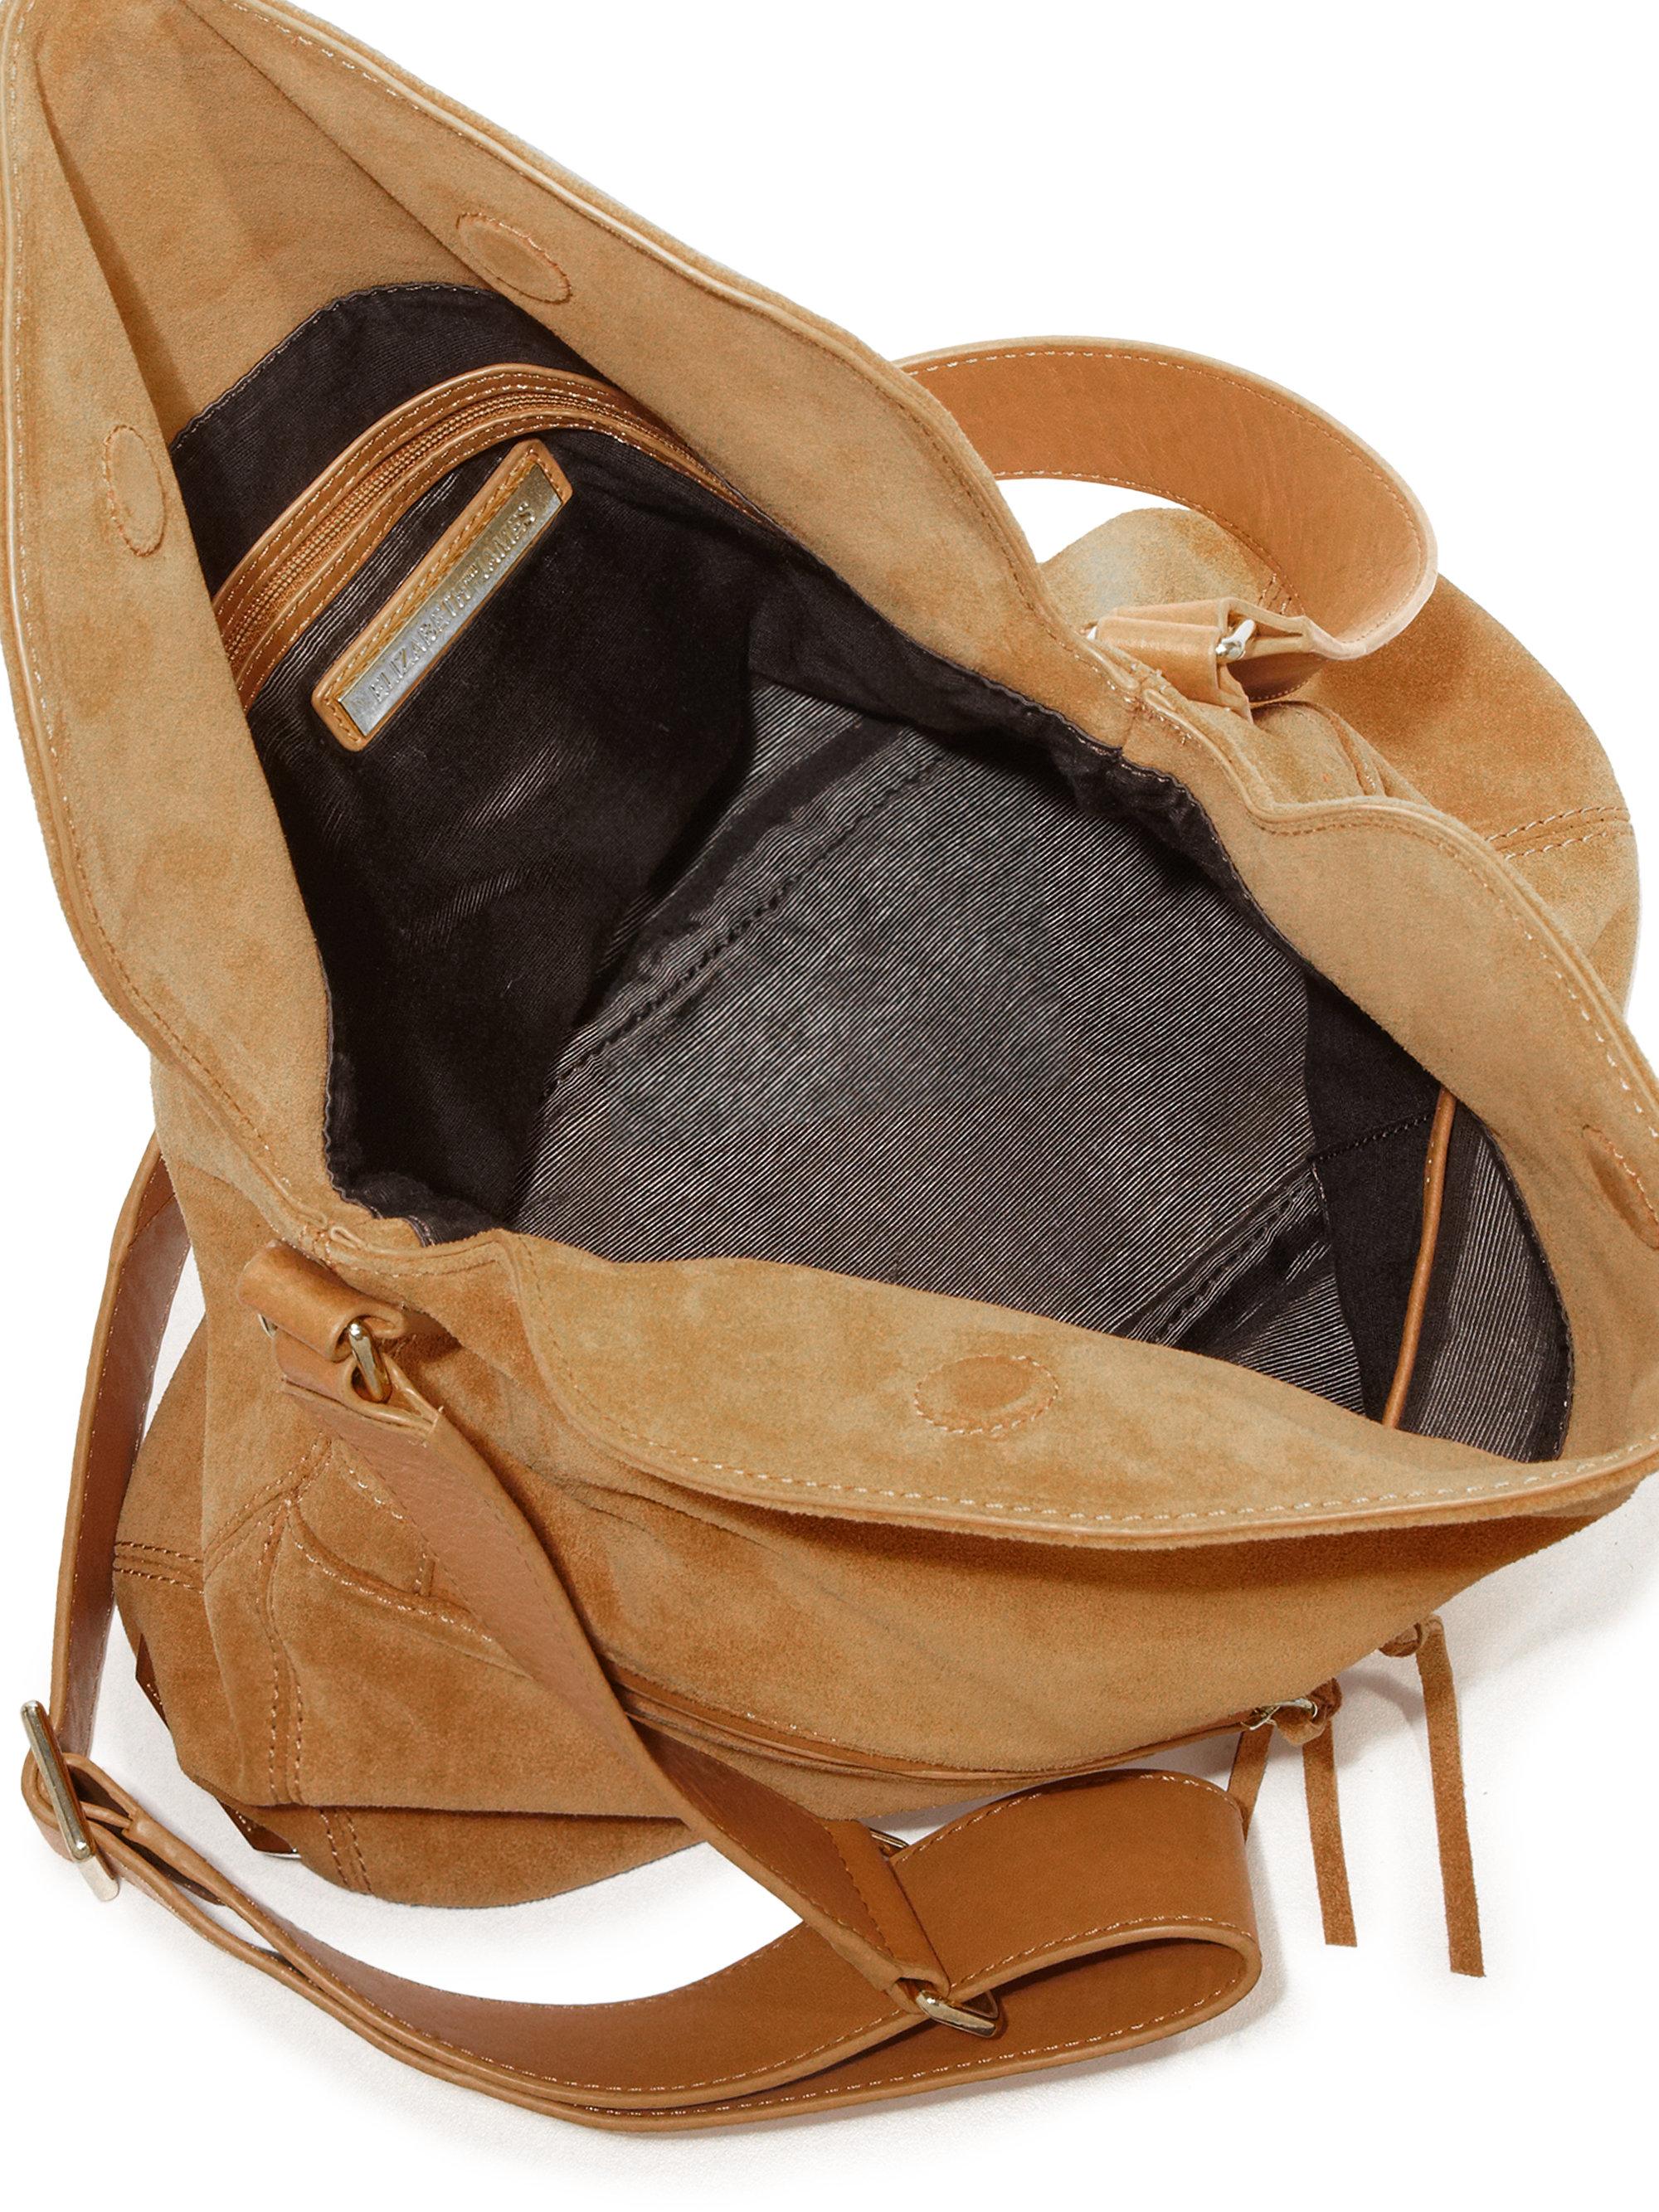 fd9703f93f83 Lyst - Elizabeth and James James Suede Crossbody Hobo Bag in Brown